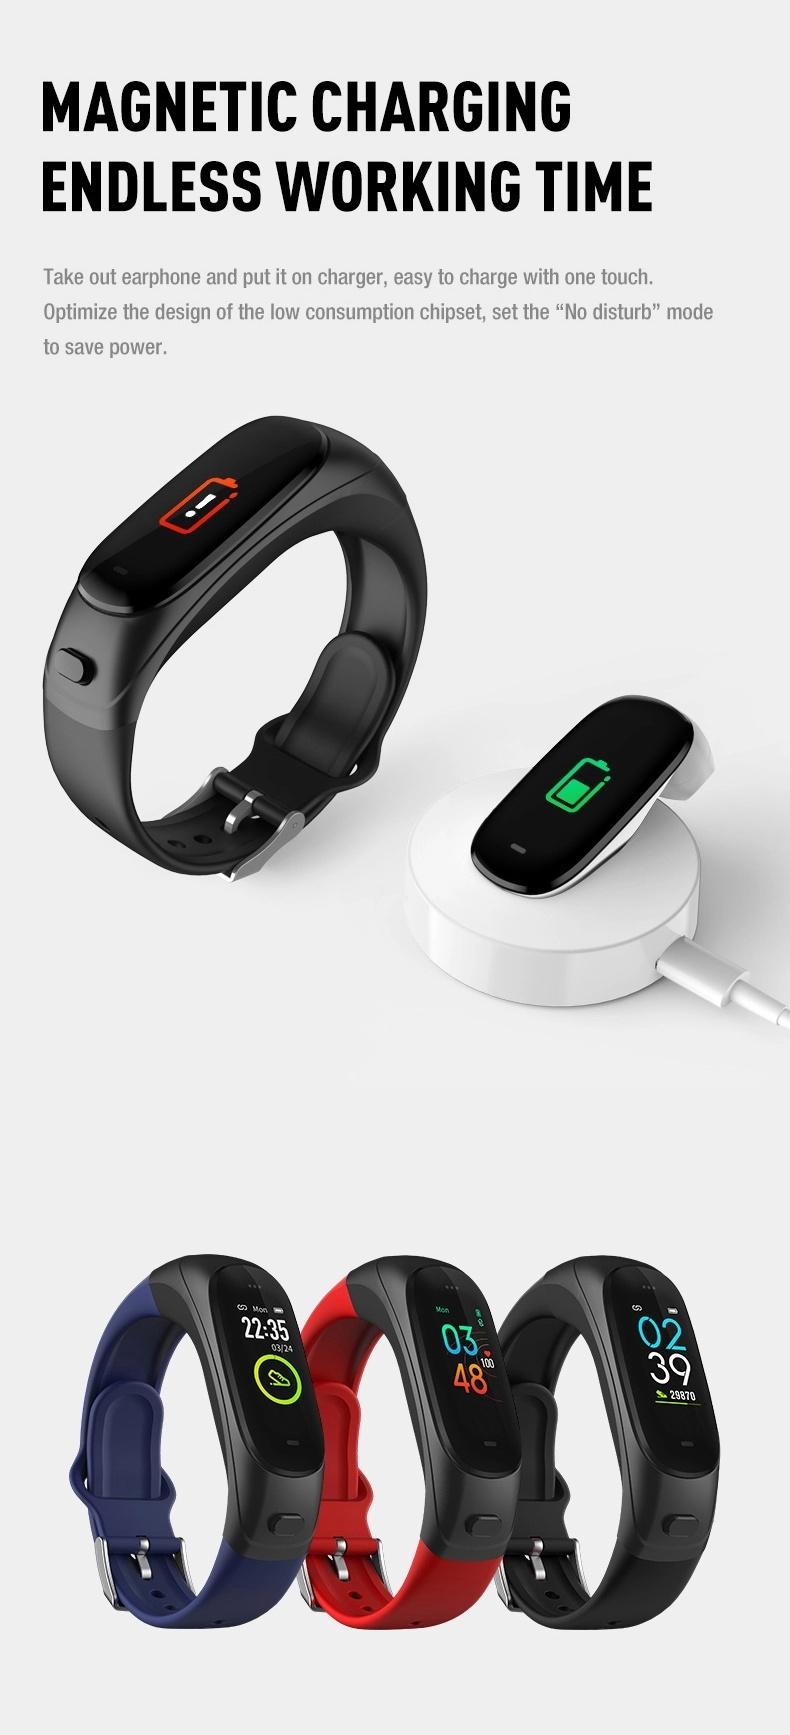 How To Charge Smart Bracelet : charge, smart, bracelet, رسم, ينزف, ساركوما, Smart, Bracelet, Charger, Outofstepwineco.com